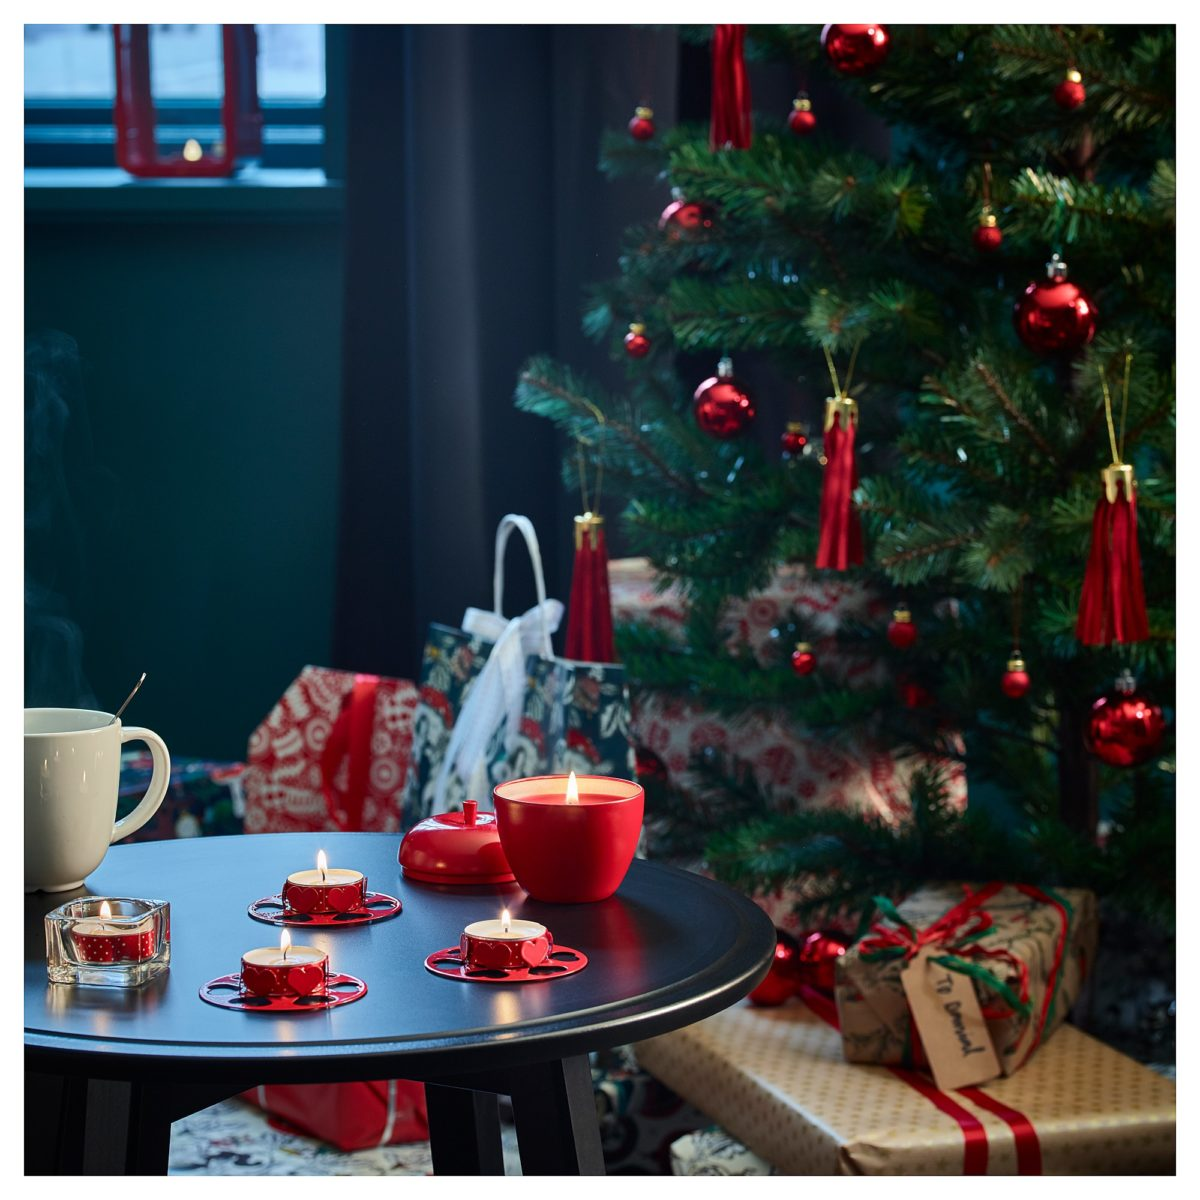 Addobbi Natalizi Ikea.Catalogo Natale 2018 Di Tendenze Dai Brand